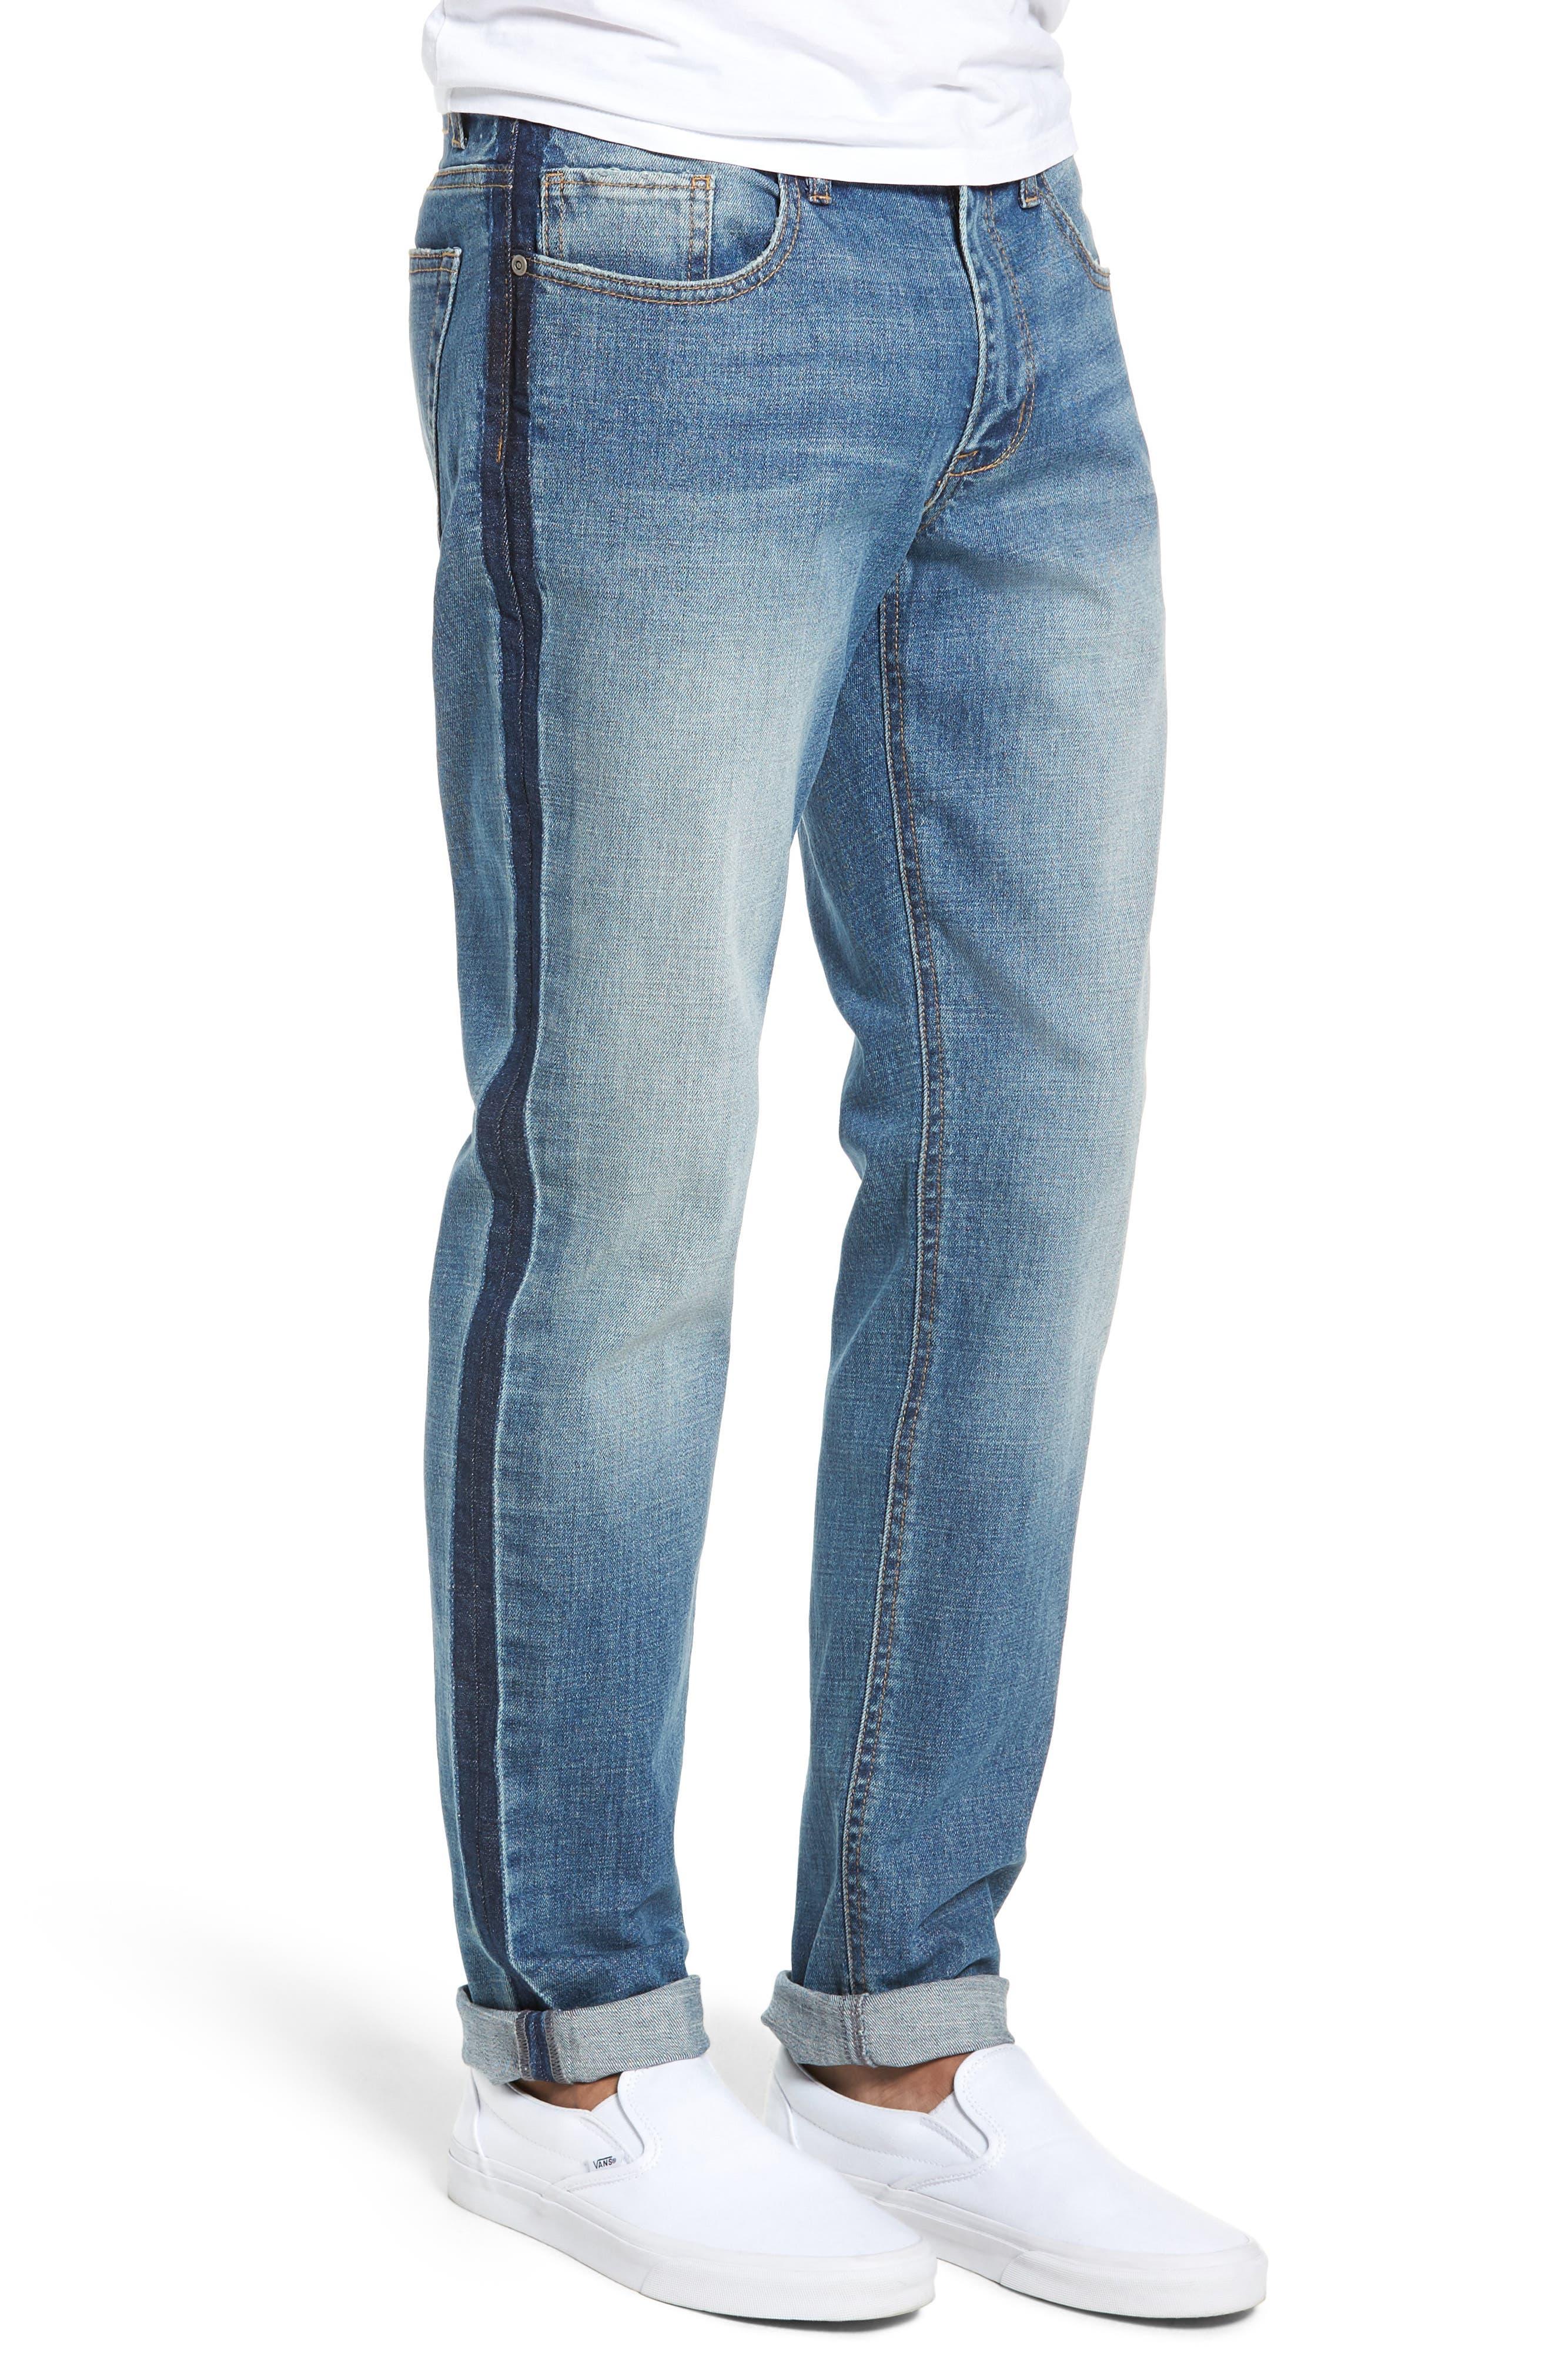 Slim Fit Side Stripe Jeans,                             Alternate thumbnail 3, color,                             BLUE STALEY WASH